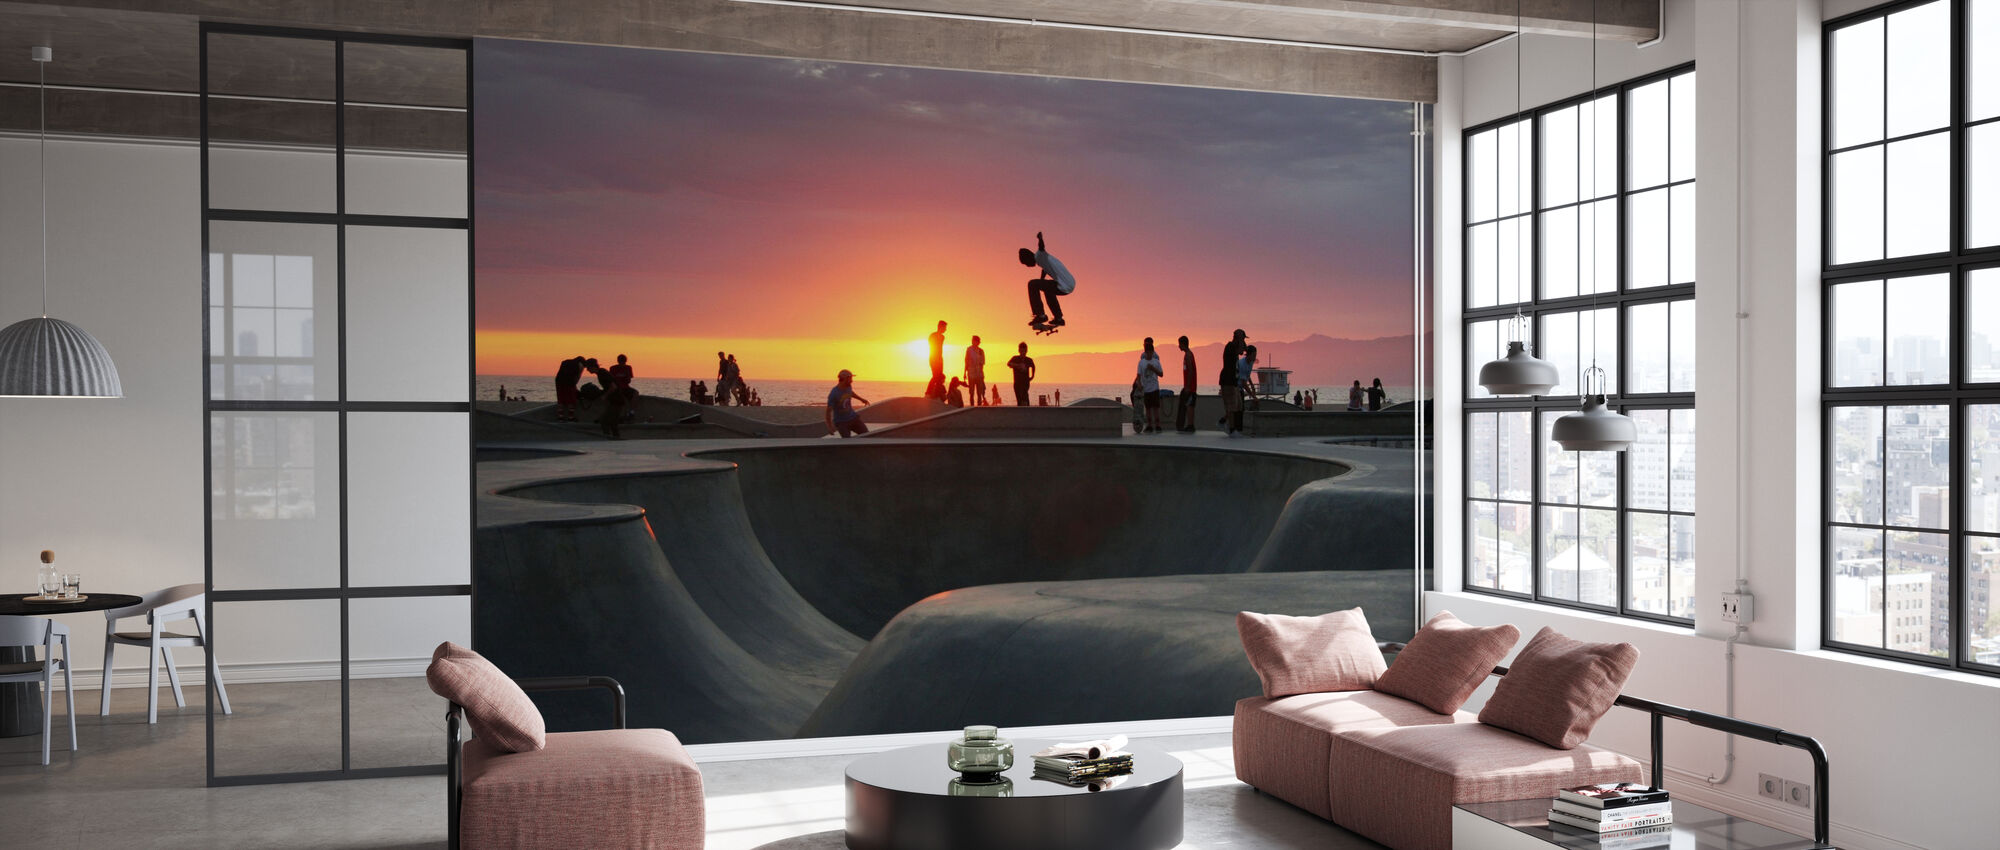 Skateboarding at the Beach - Wallpaper - Office